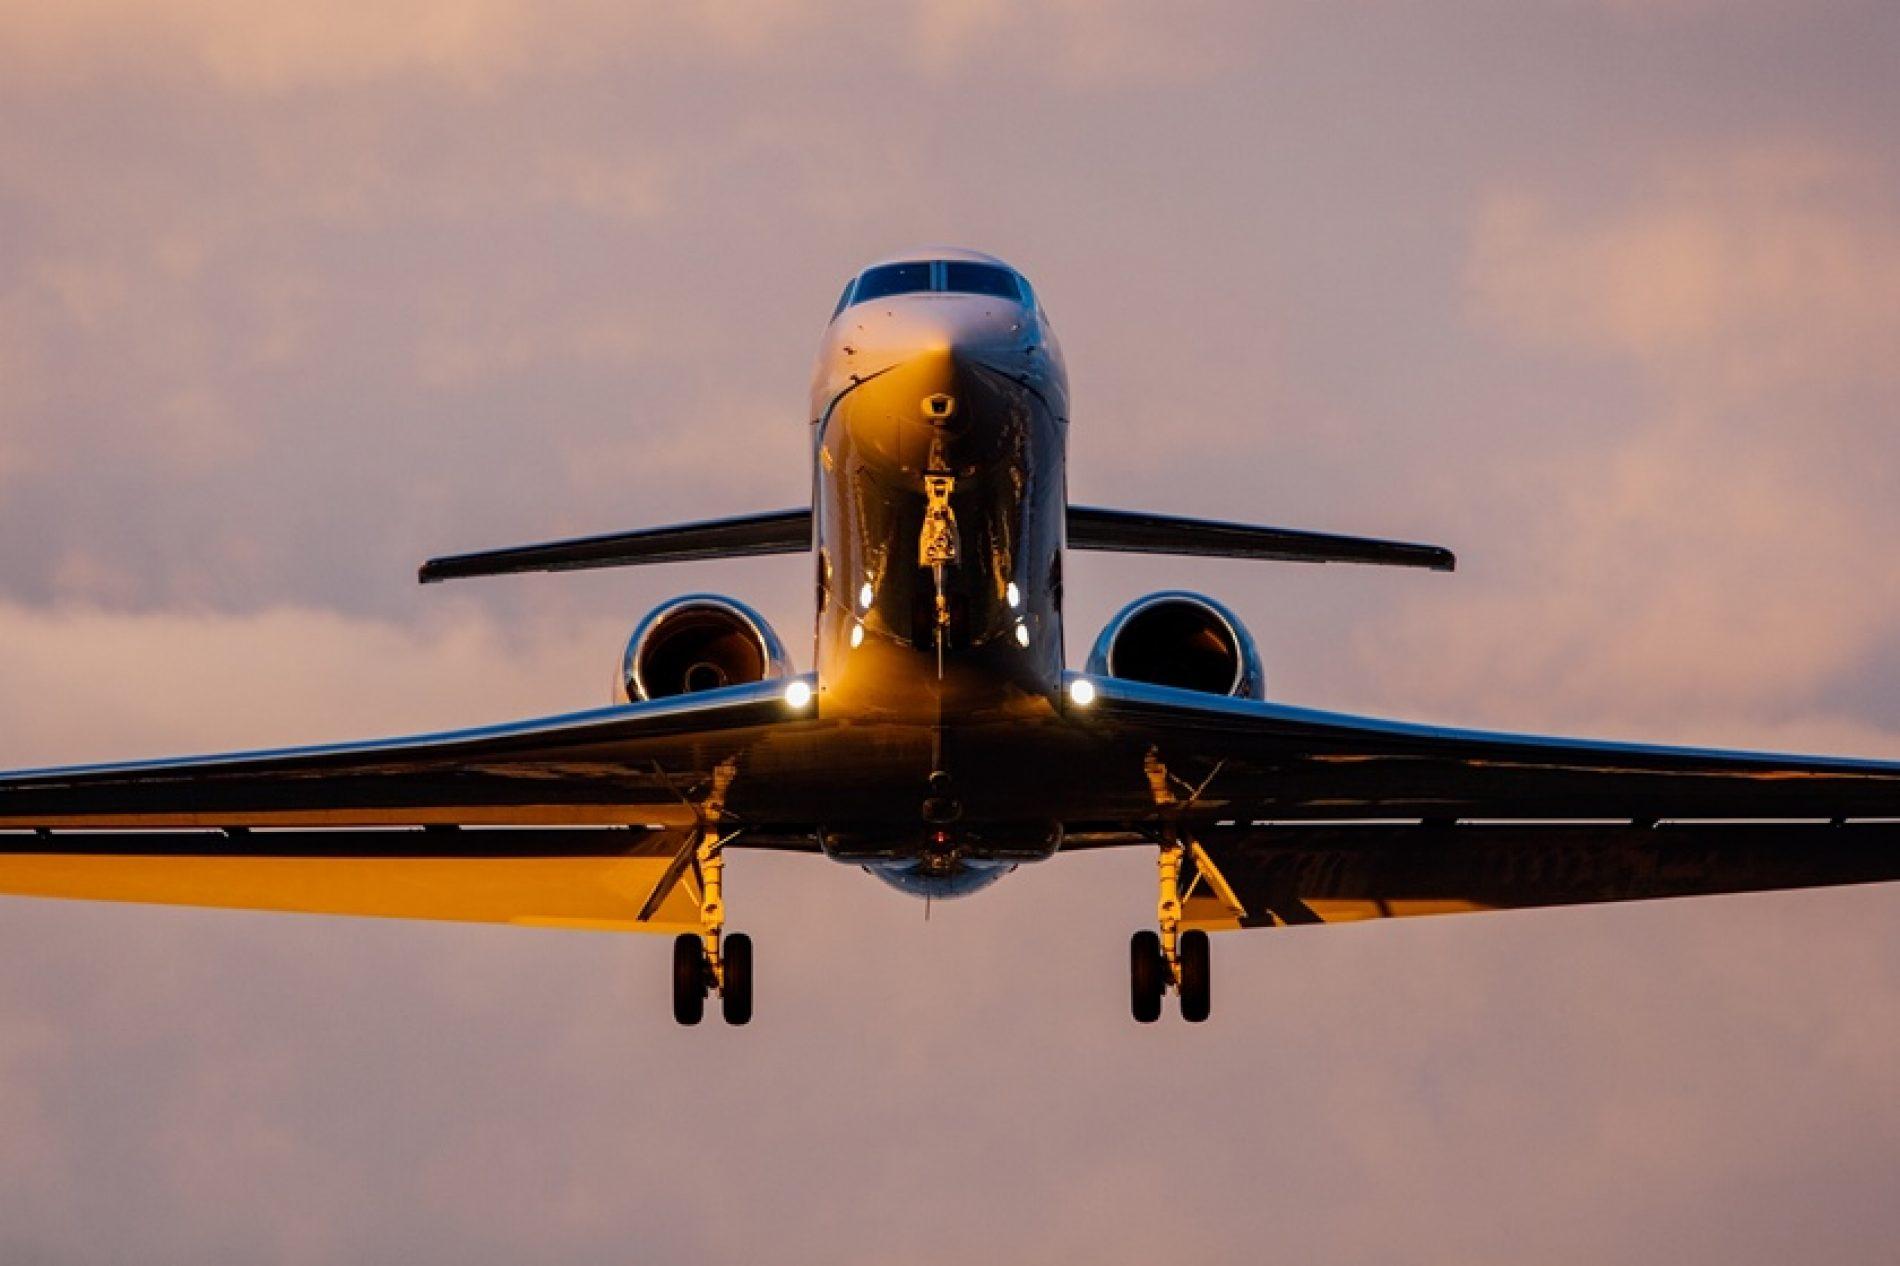 Menina de 14 anos morre durante voo da Latam que saiu de Miami